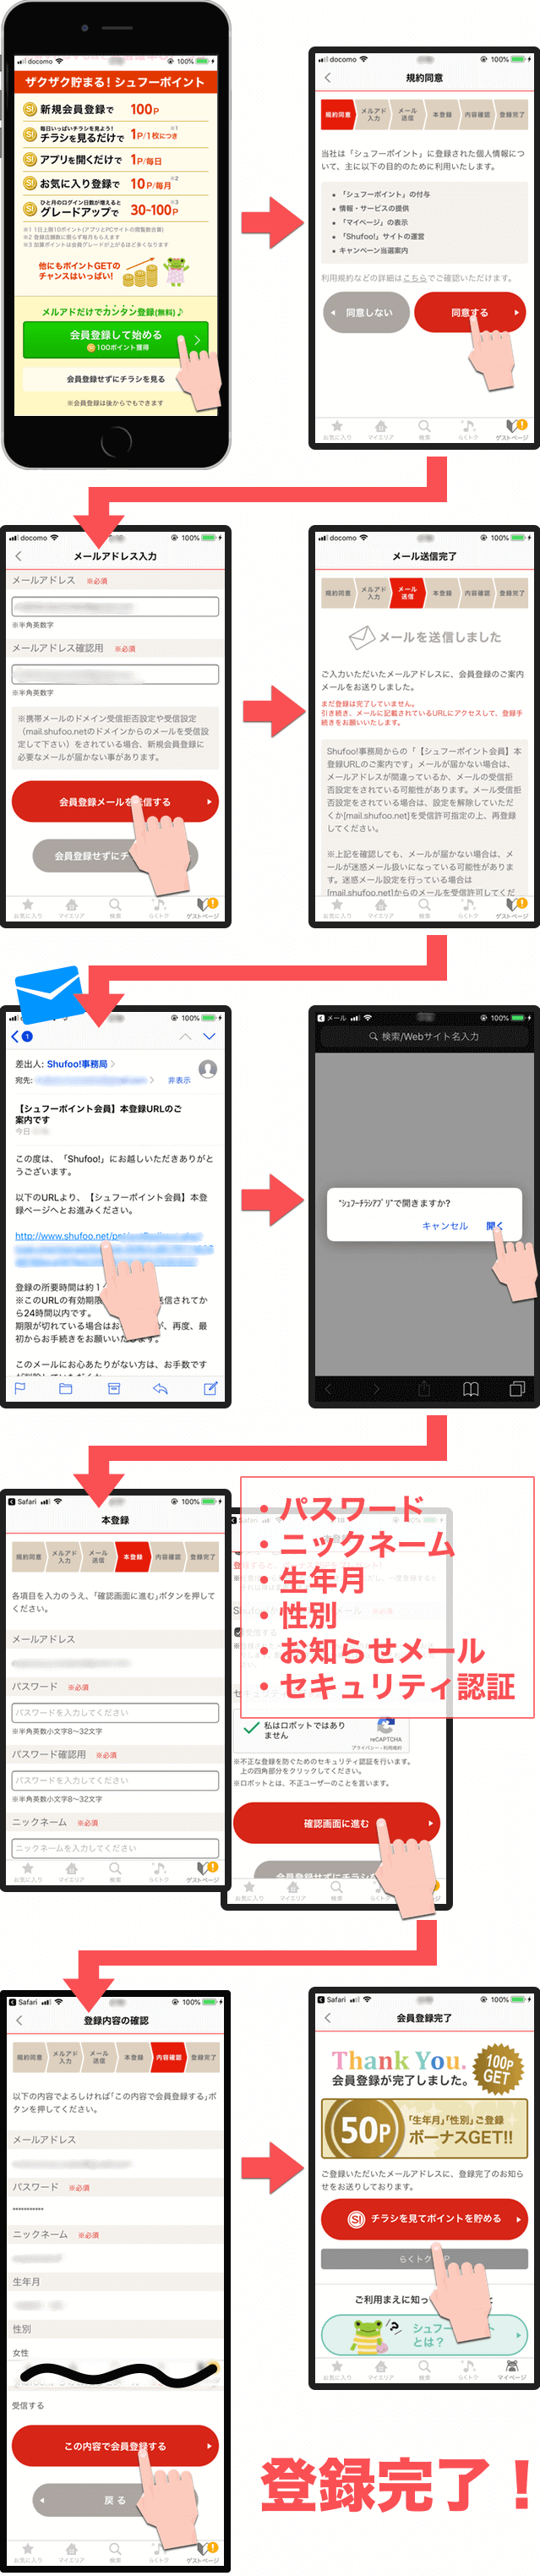 shufooのユーザー会員登録手順・方法